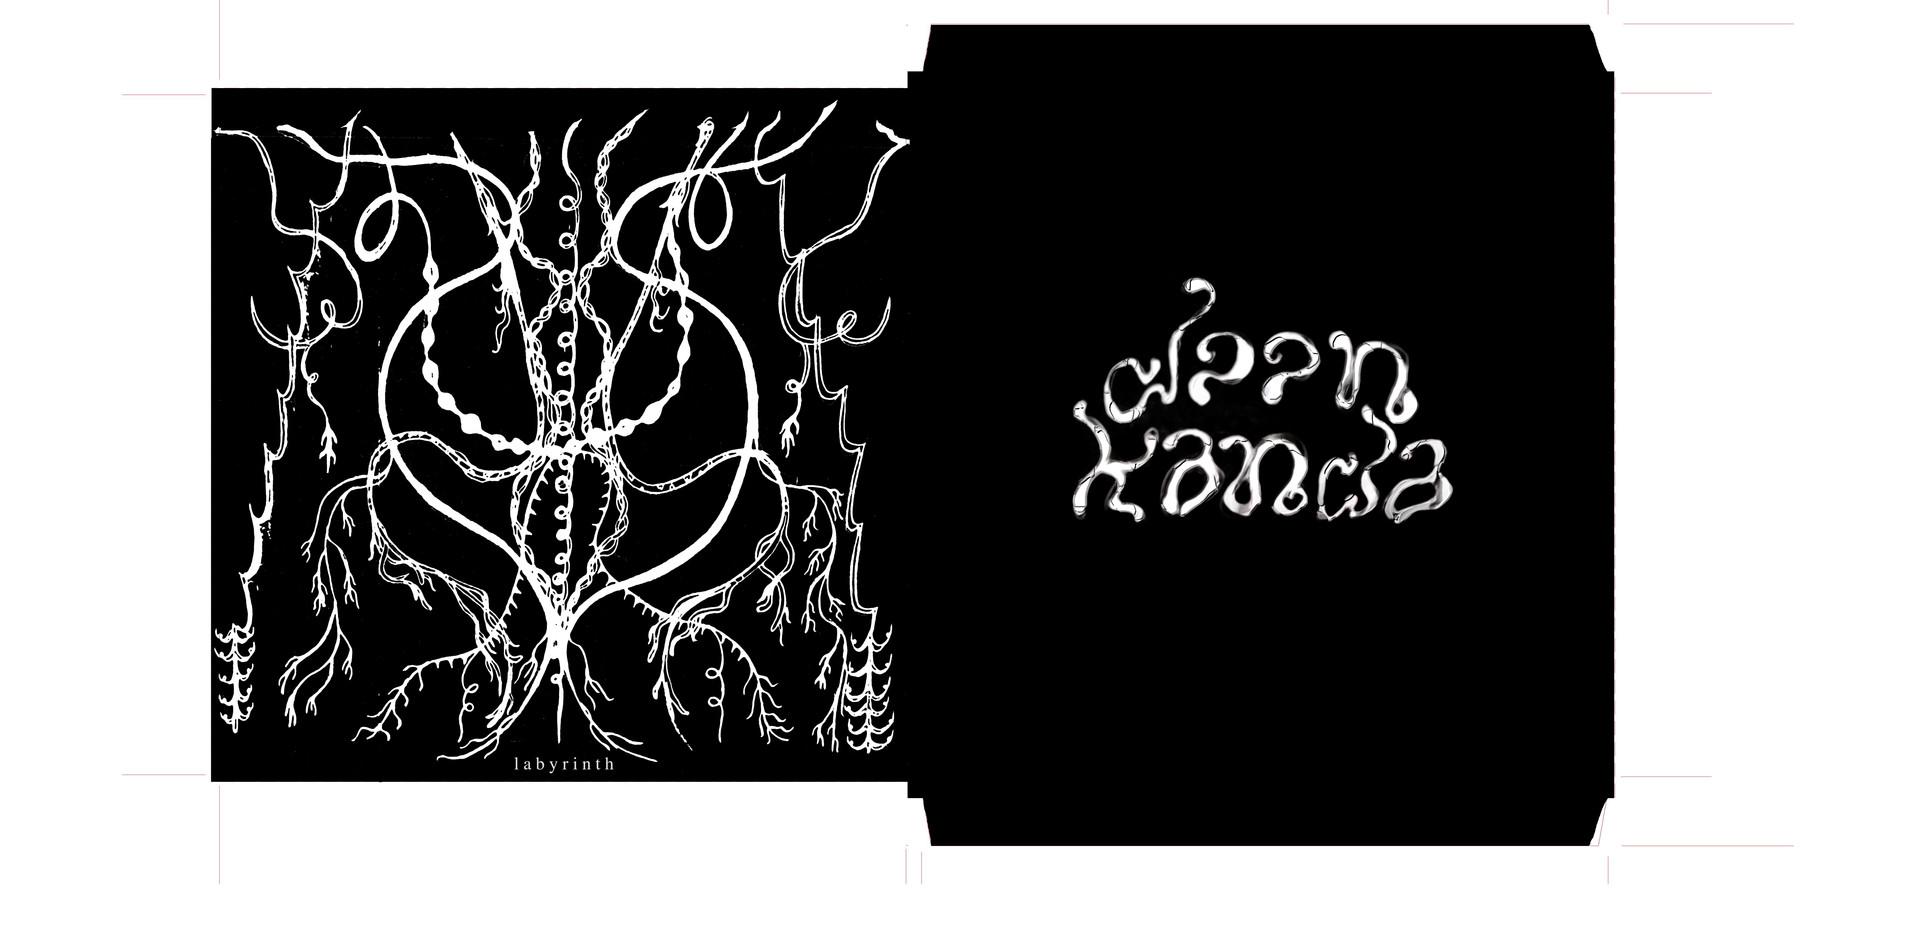 Doon Kanda's Labyrinth